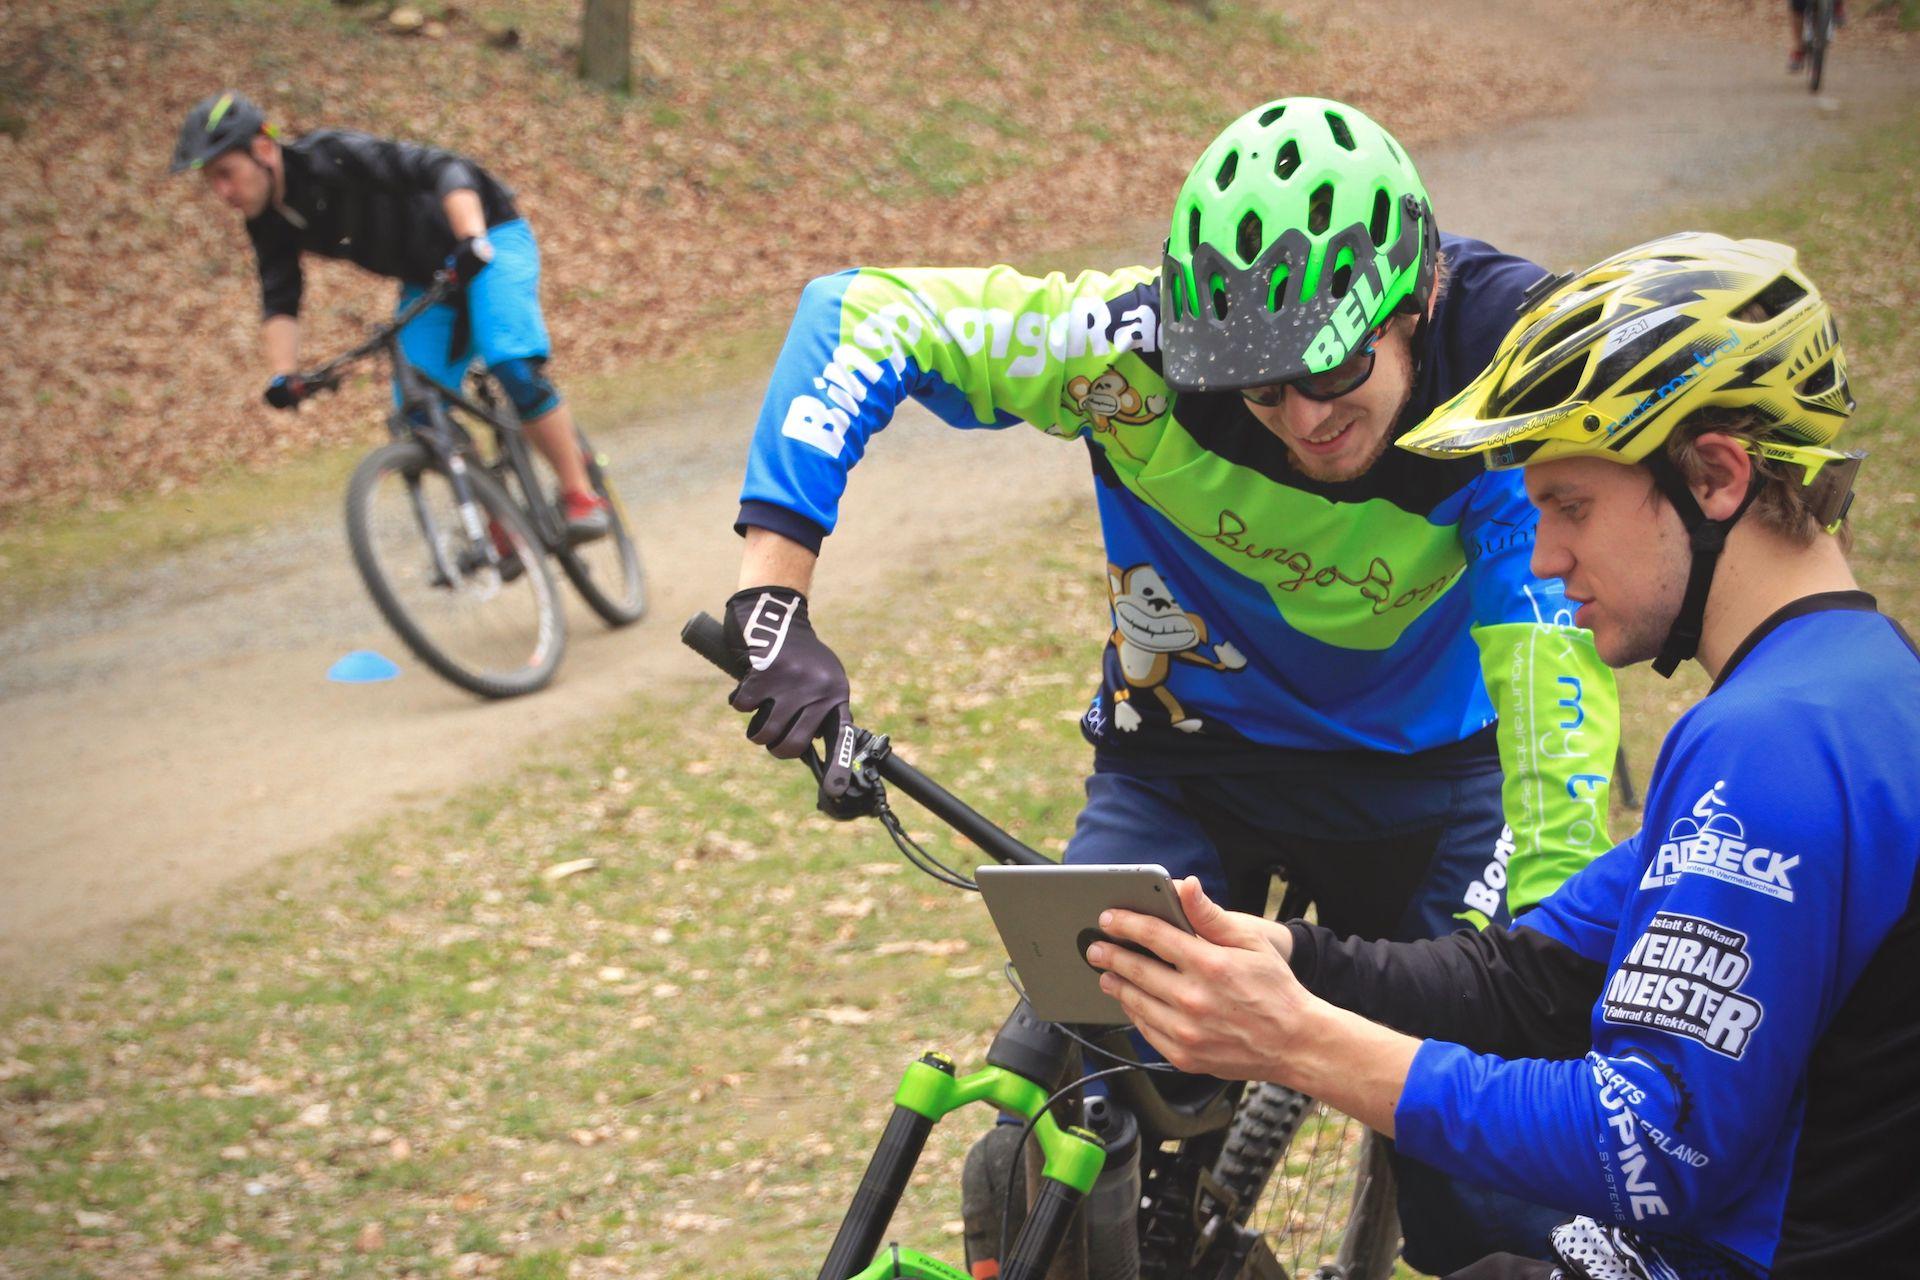 MTB eBike Fahrtechnik Kurse in Hessen Training Trails Einsteiger Fortgeschritten Experte Rock my Trail Bikeschule -1